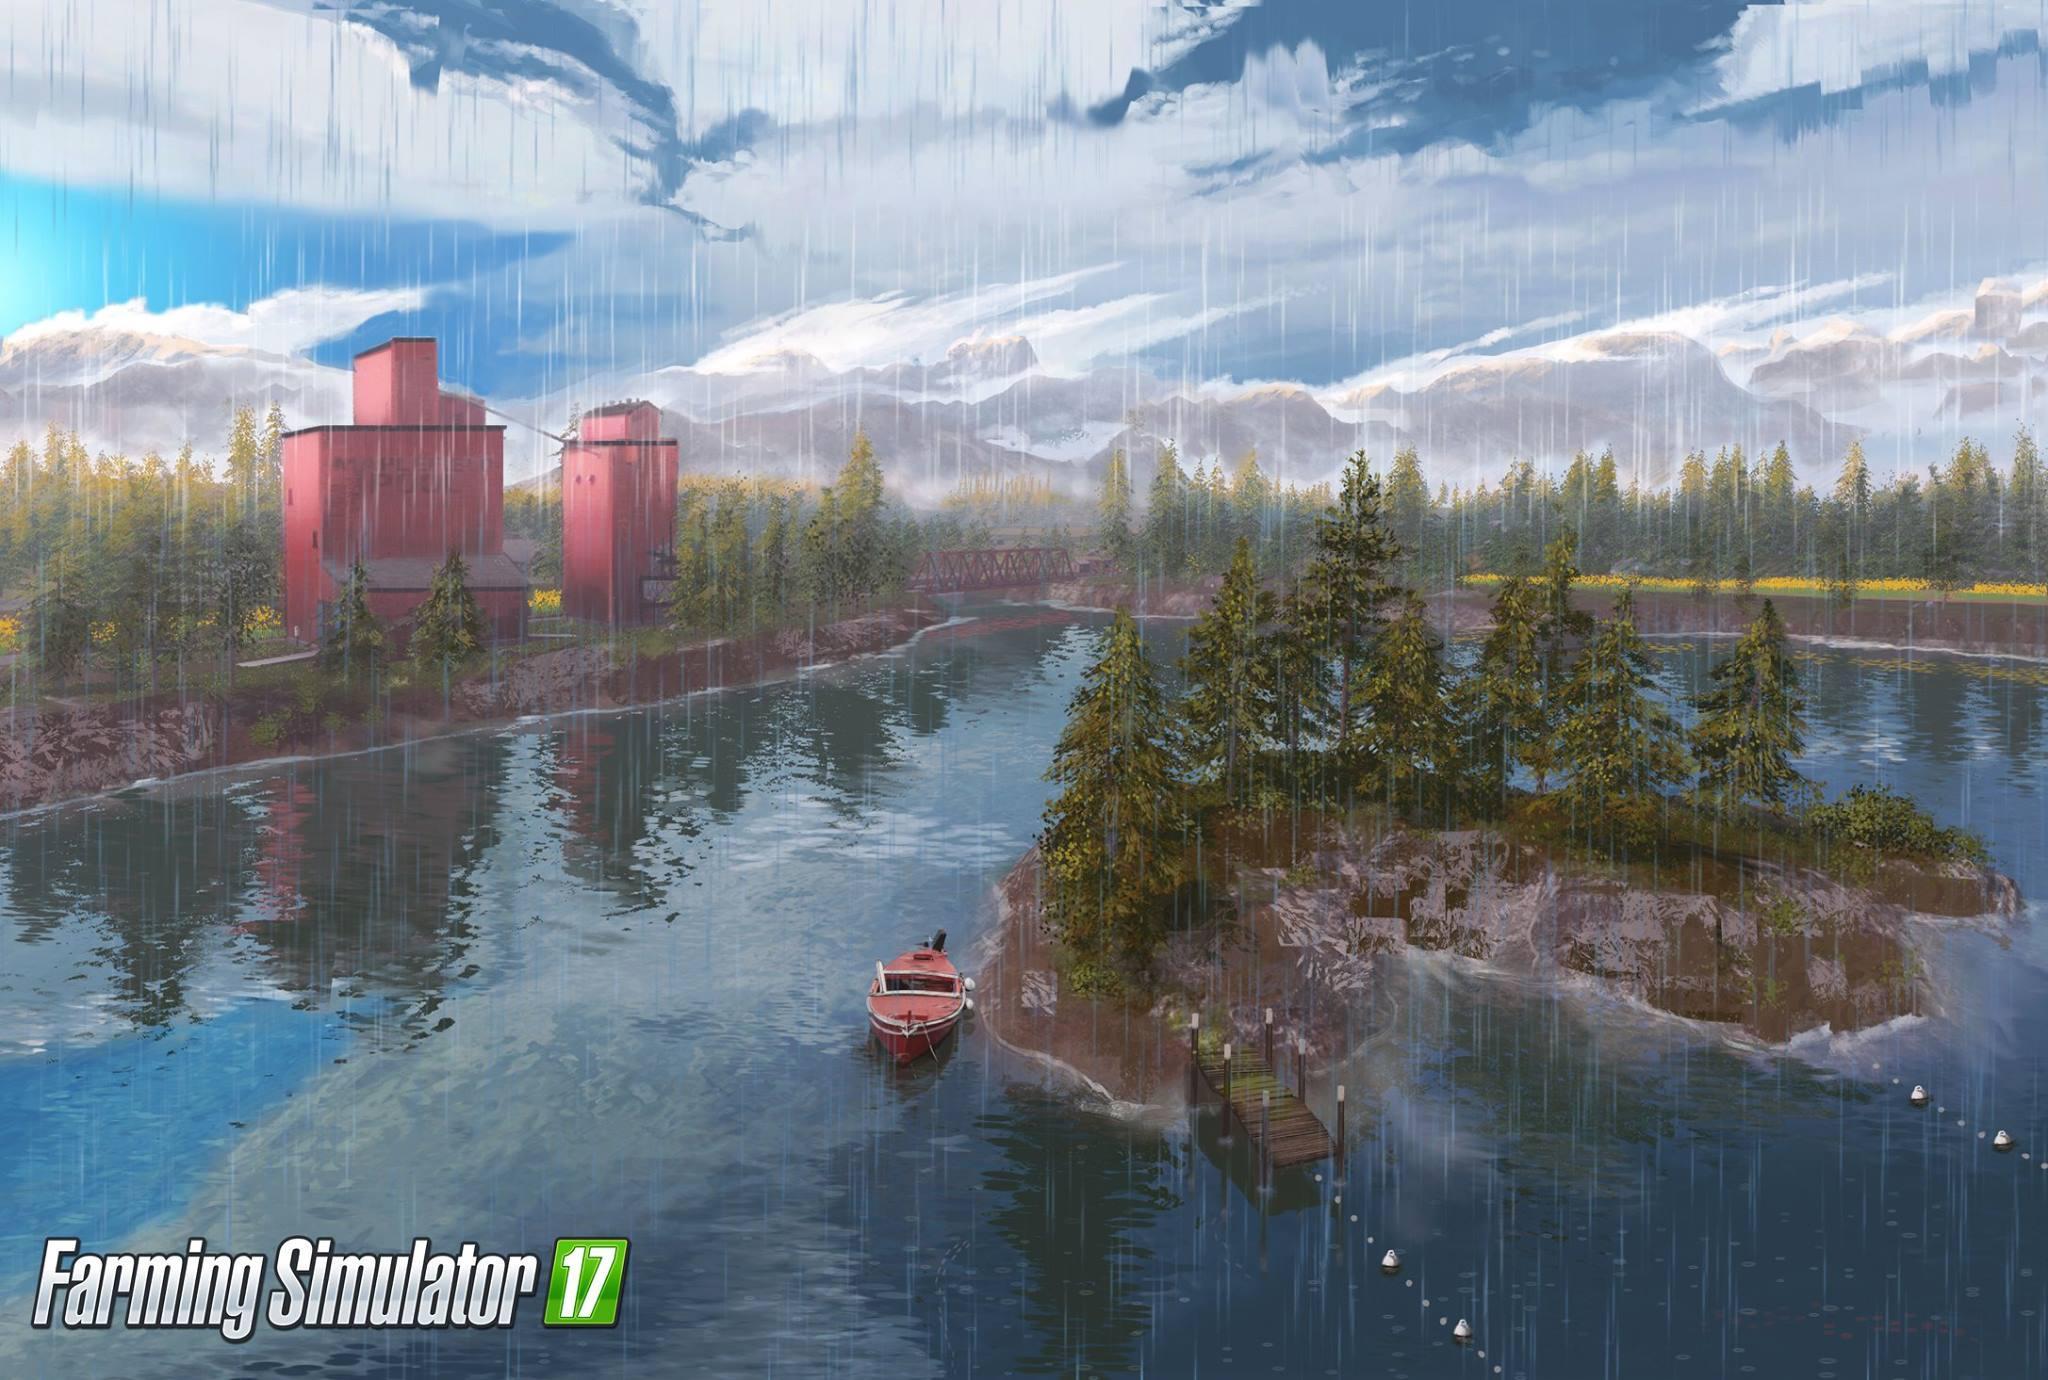 Farming Simulator 17 Archives • Farming simulator 19, 17, 15